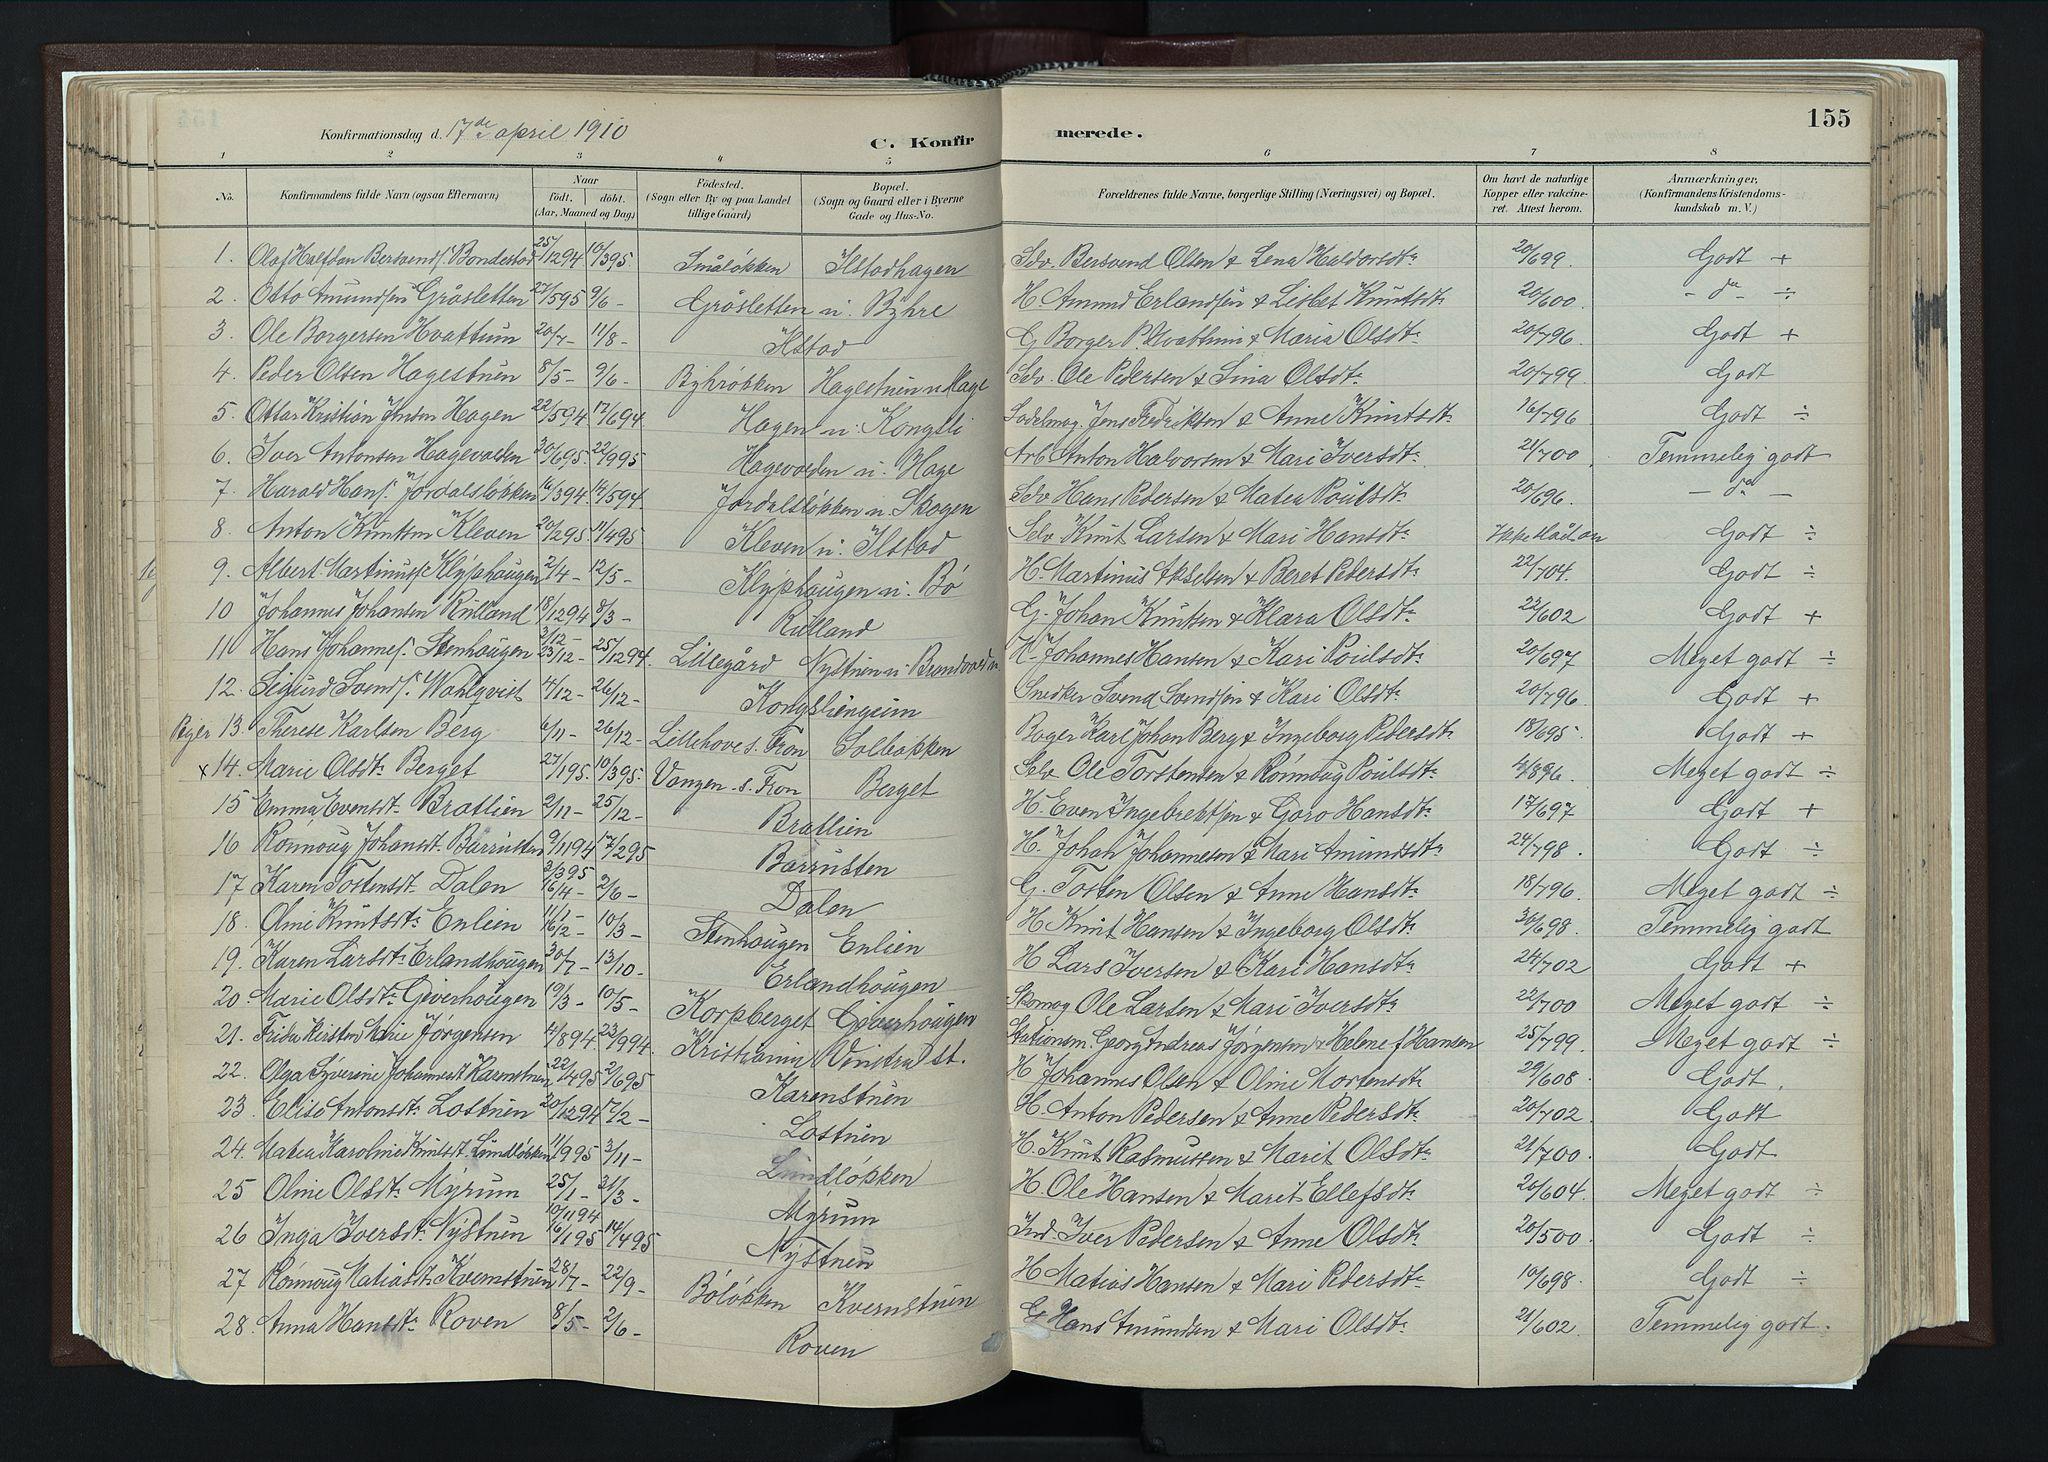 SAH, Nord-Fron prestekontor, Ministerialbok nr. 4, 1884-1914, s. 155